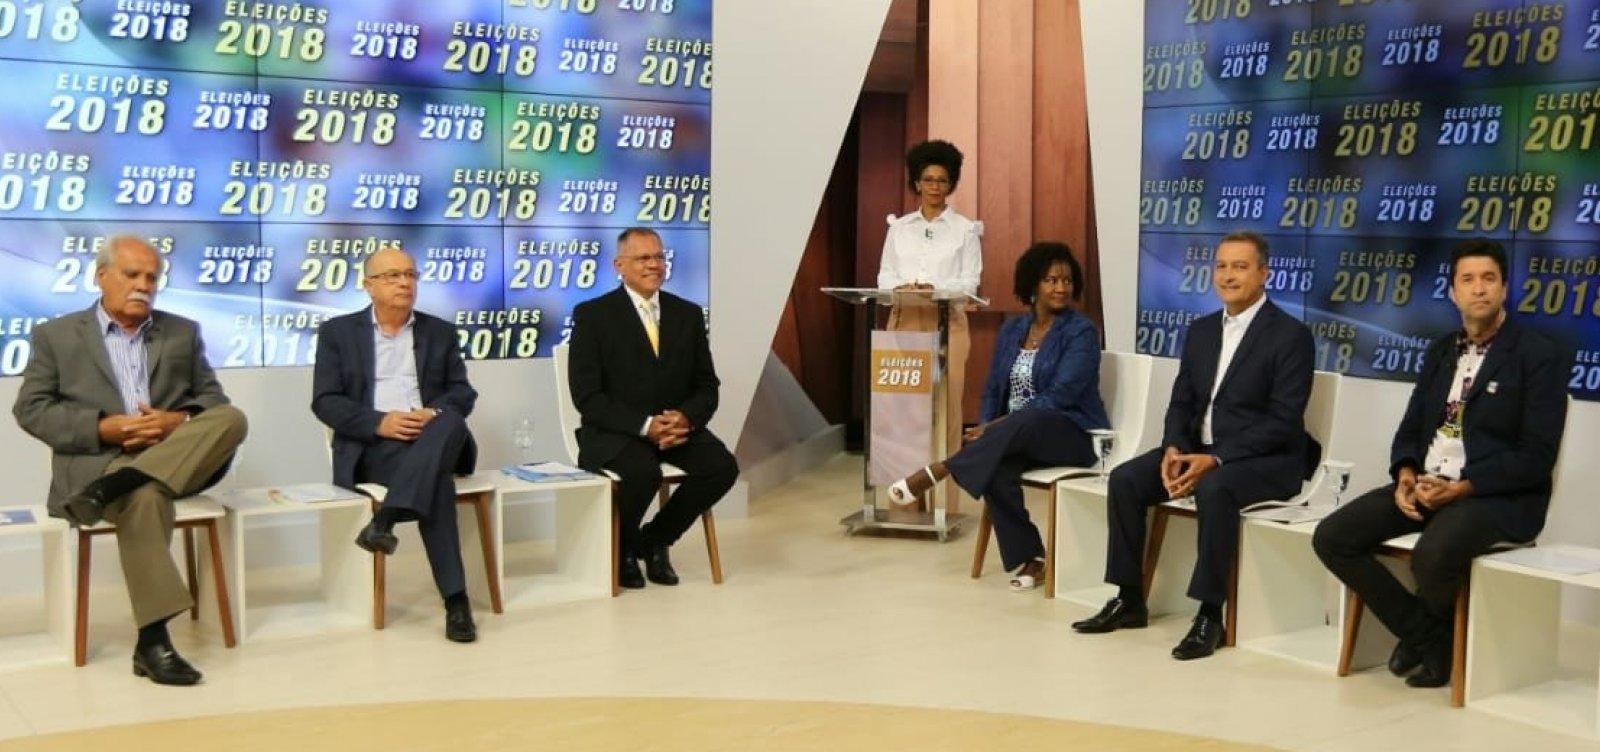 Debate da TVE entre candidatos ao governo é marcado por poucos confrontos